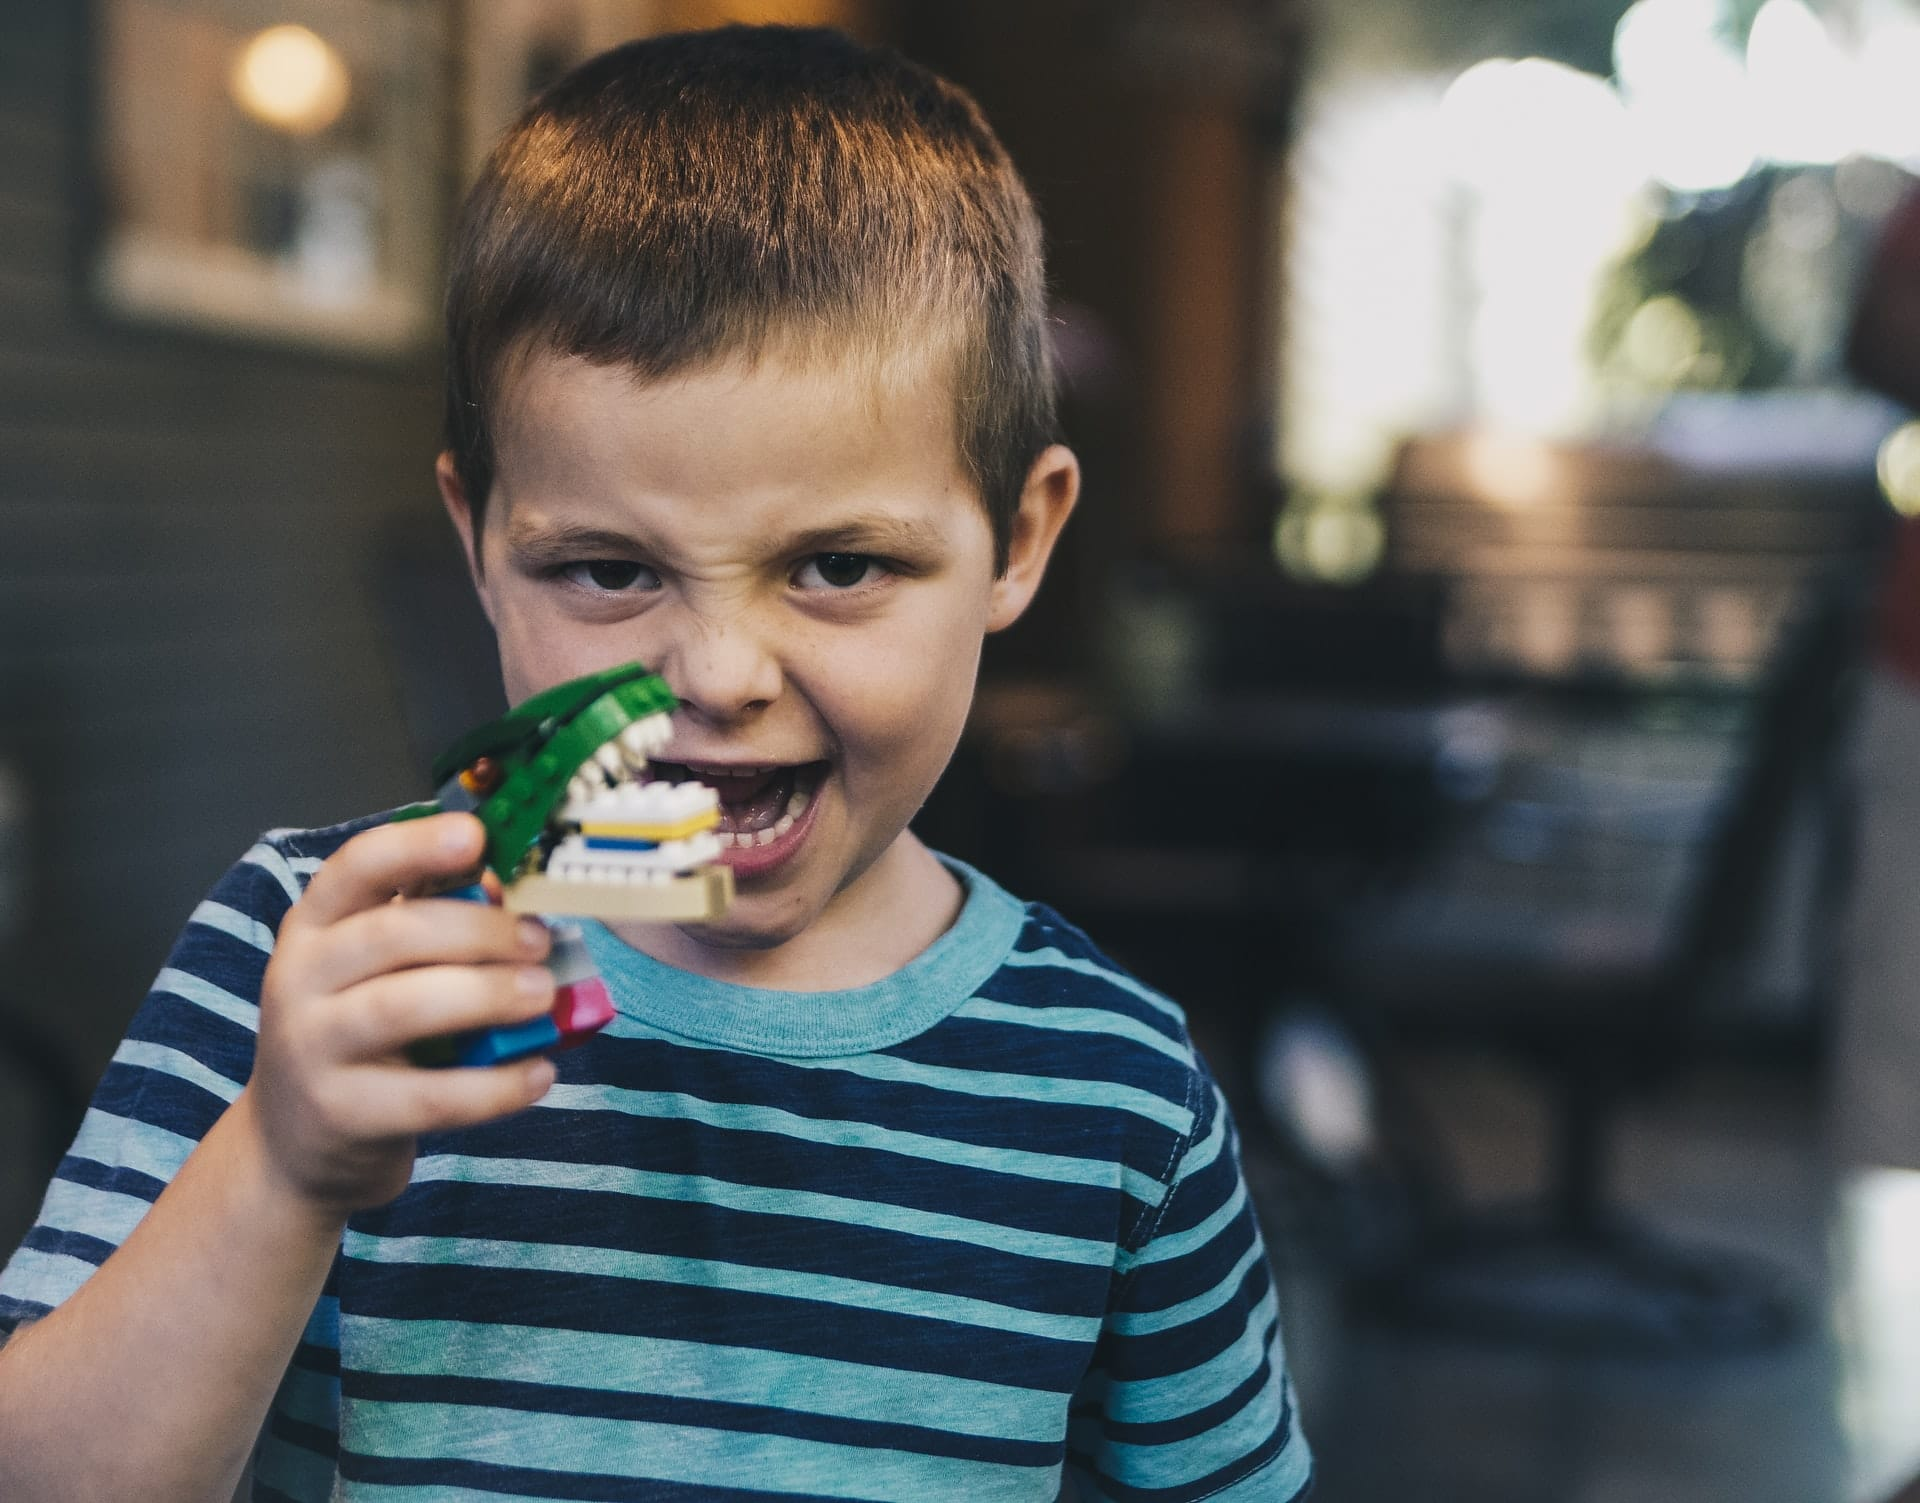 eddie kopp 3O5GPcS3juY unsplash - When Do Kids Lose Teeth?